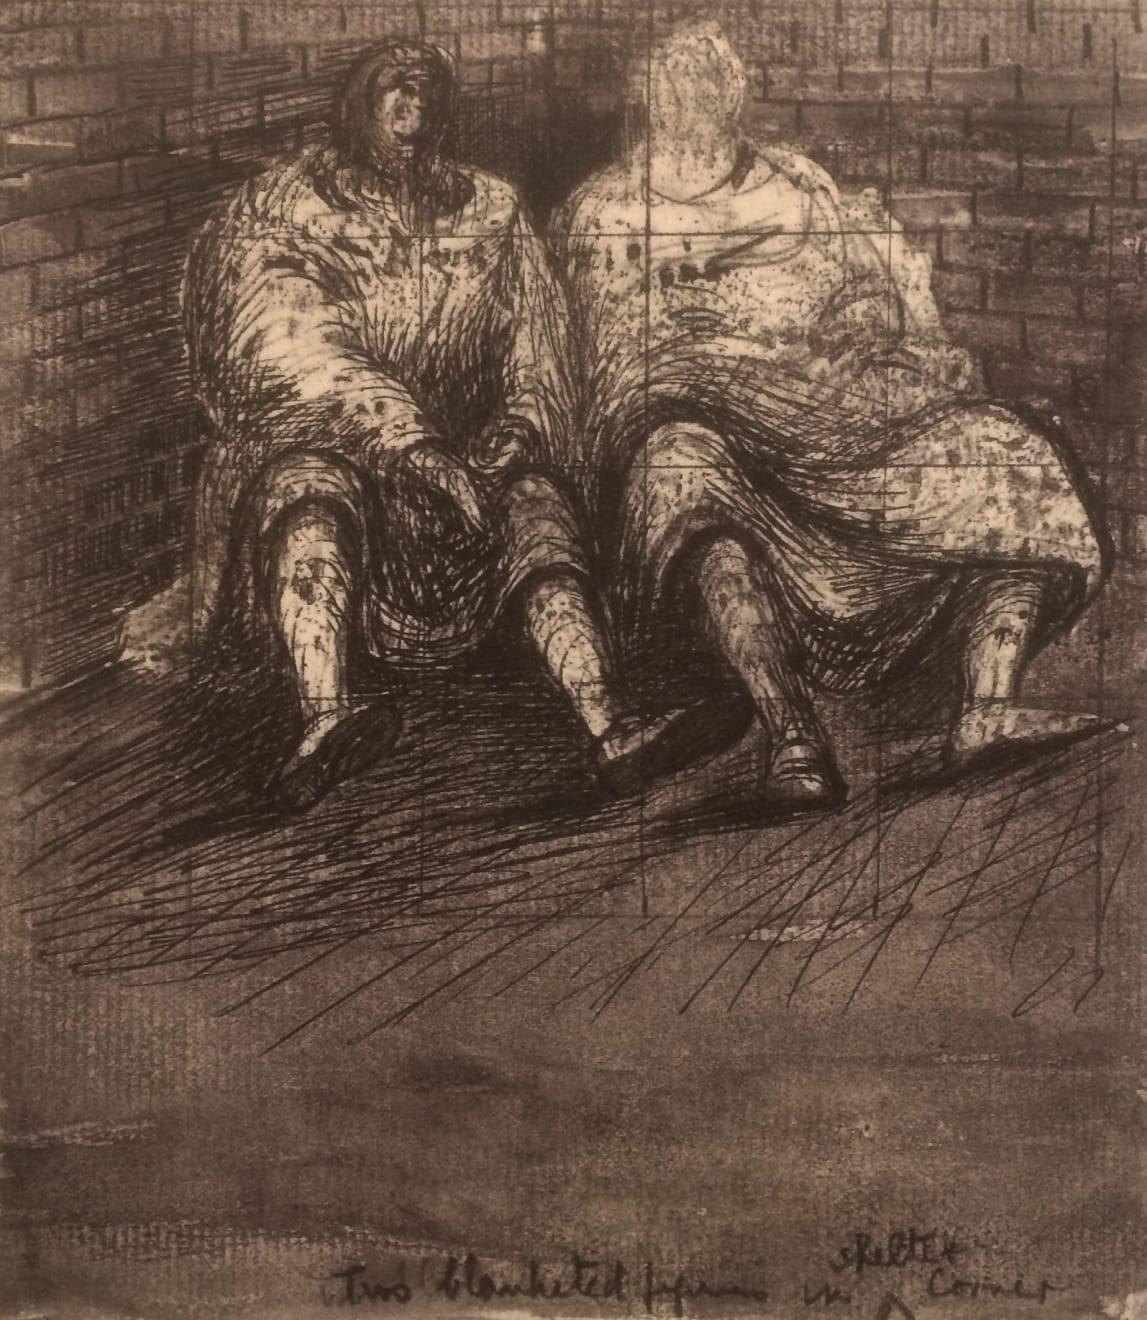 Henry Moore, Untitled XXXIX (Shelter Sketchbook), 1967